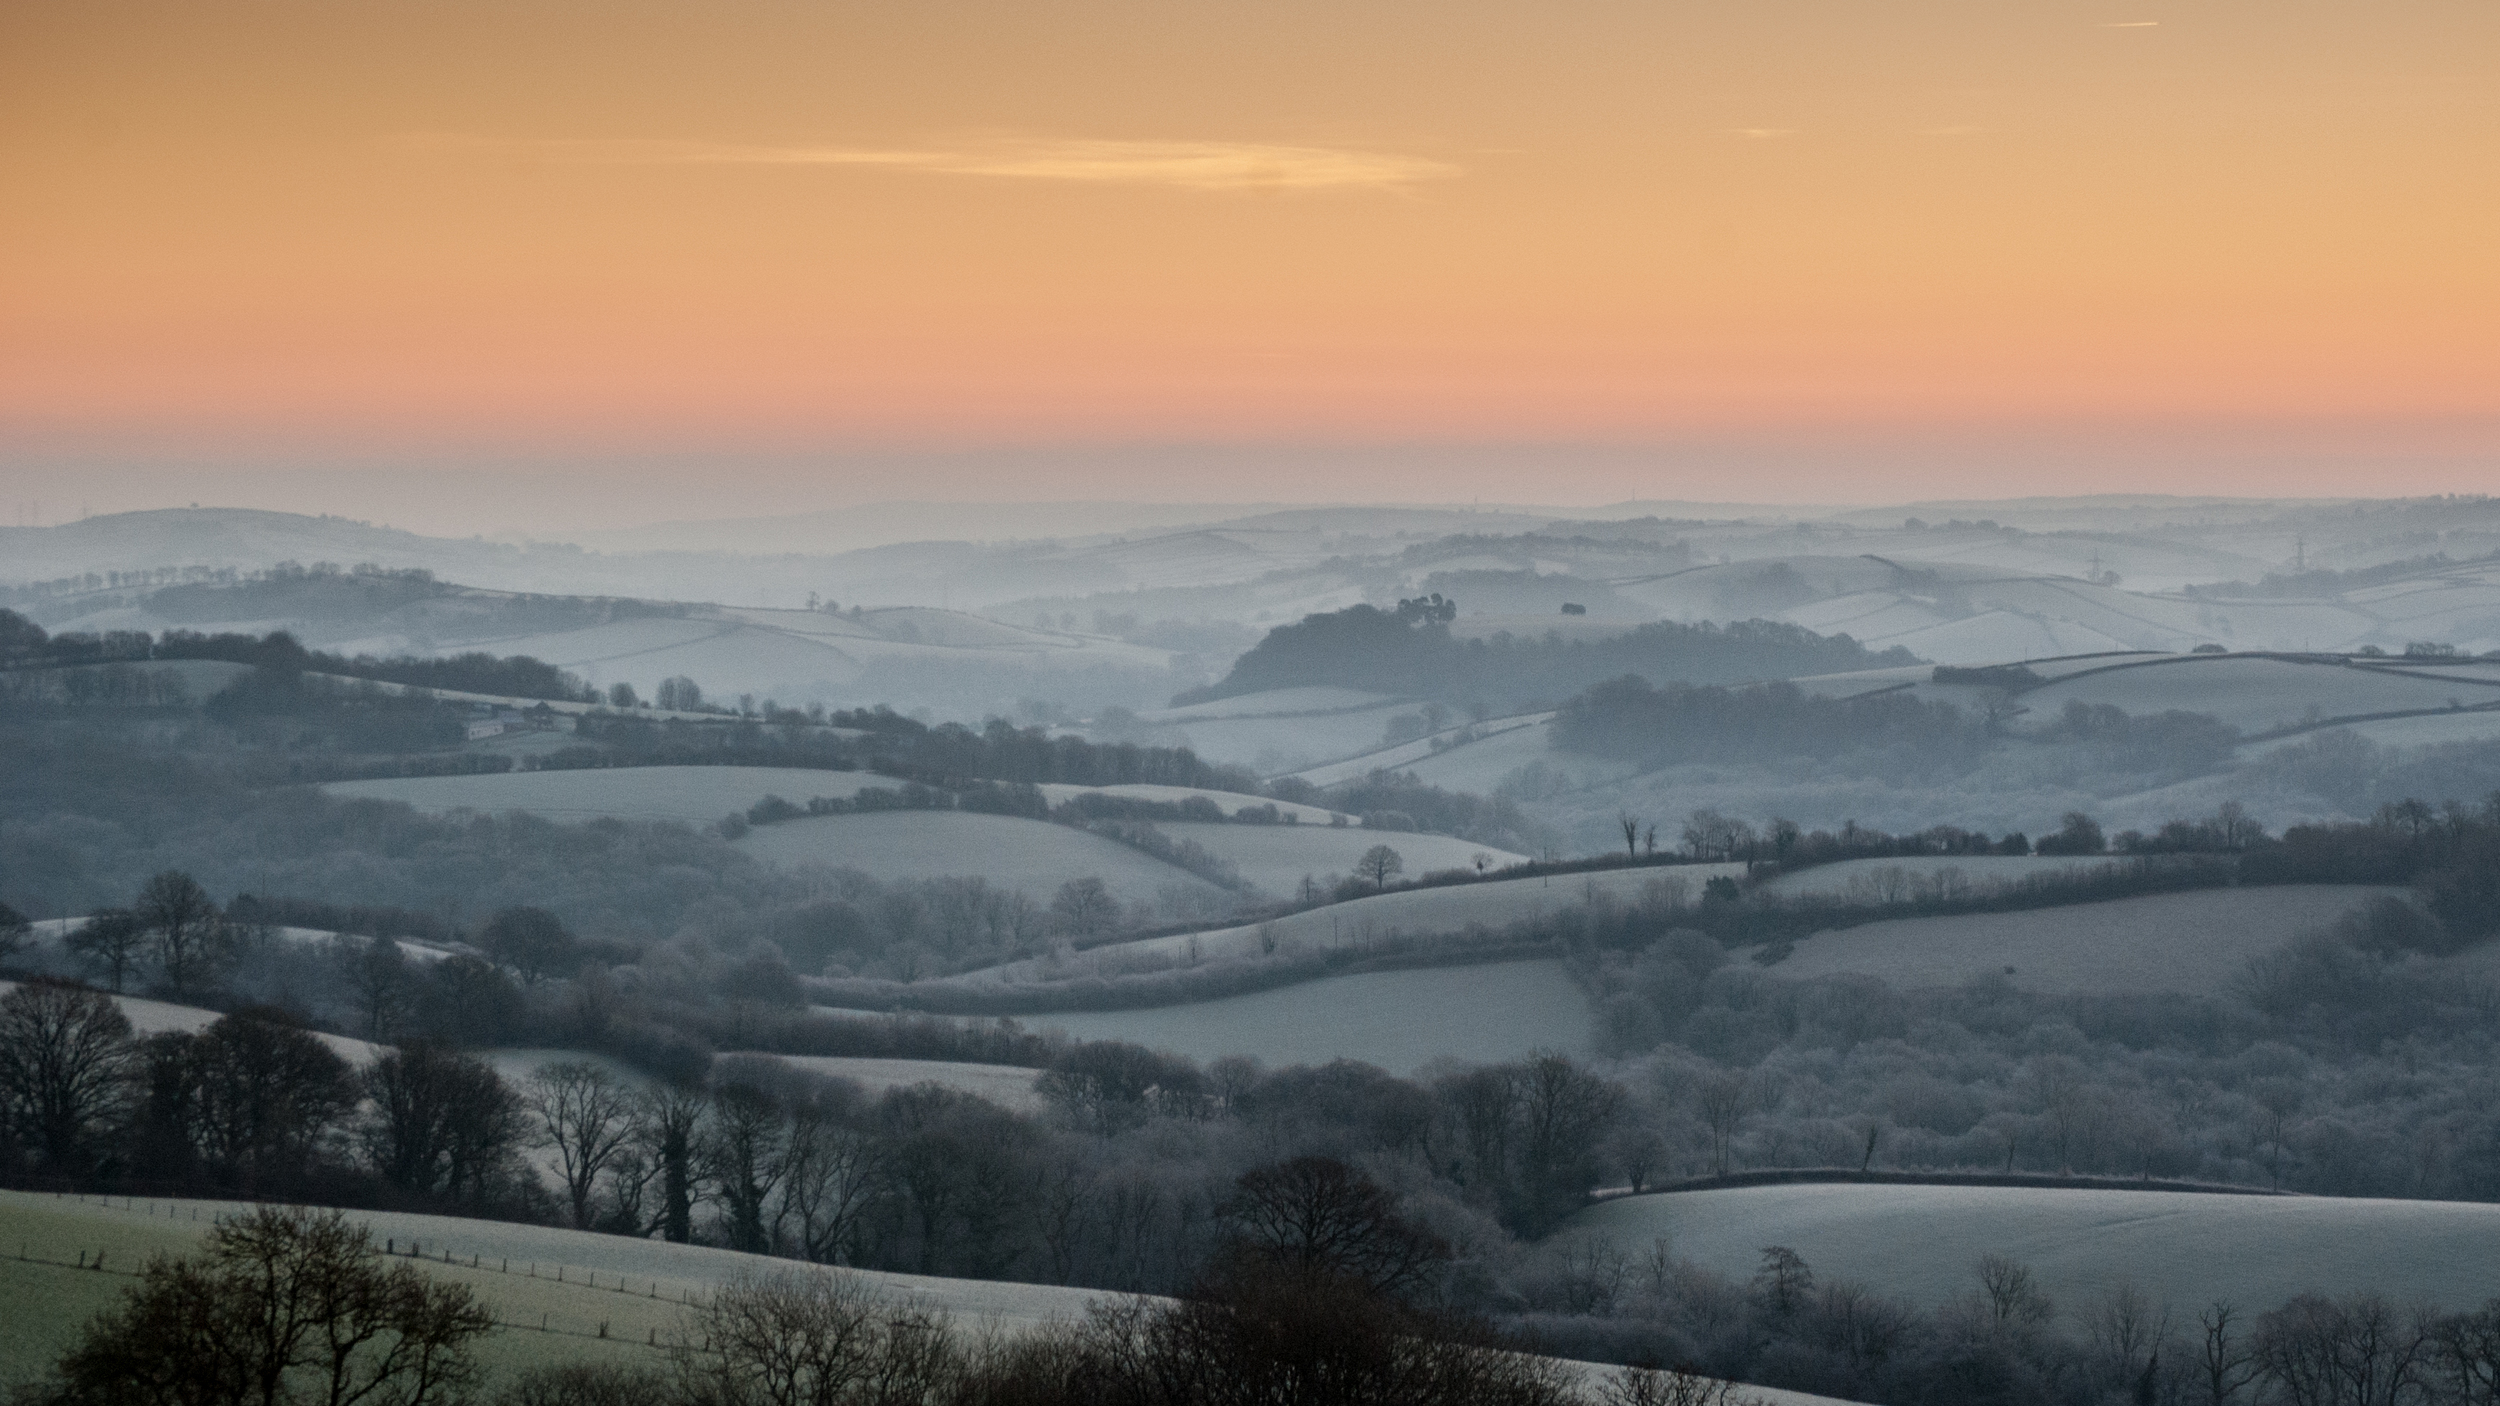 Dawn above rolling hills on Exmoor, Devon